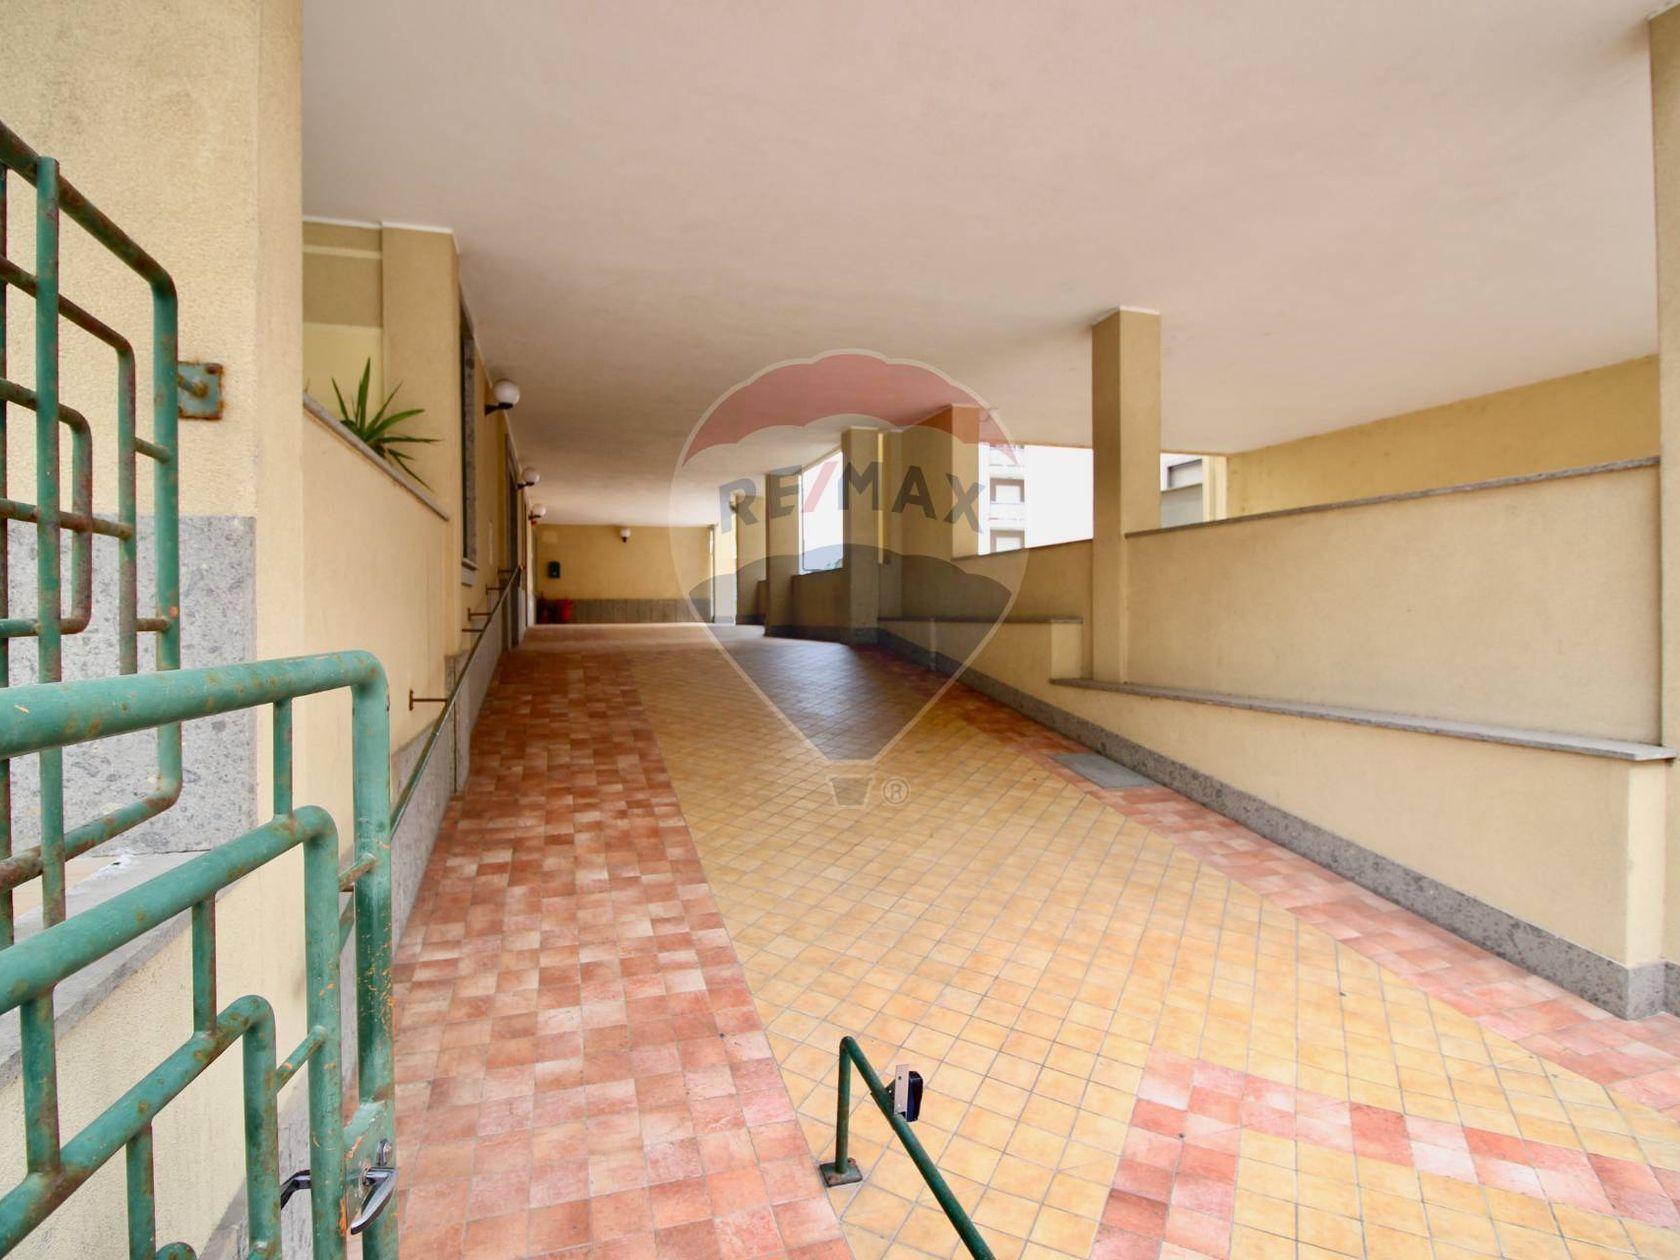 Appartamento Ss-s. Orsola Storica, Sassari, SS Vendita - Foto 20